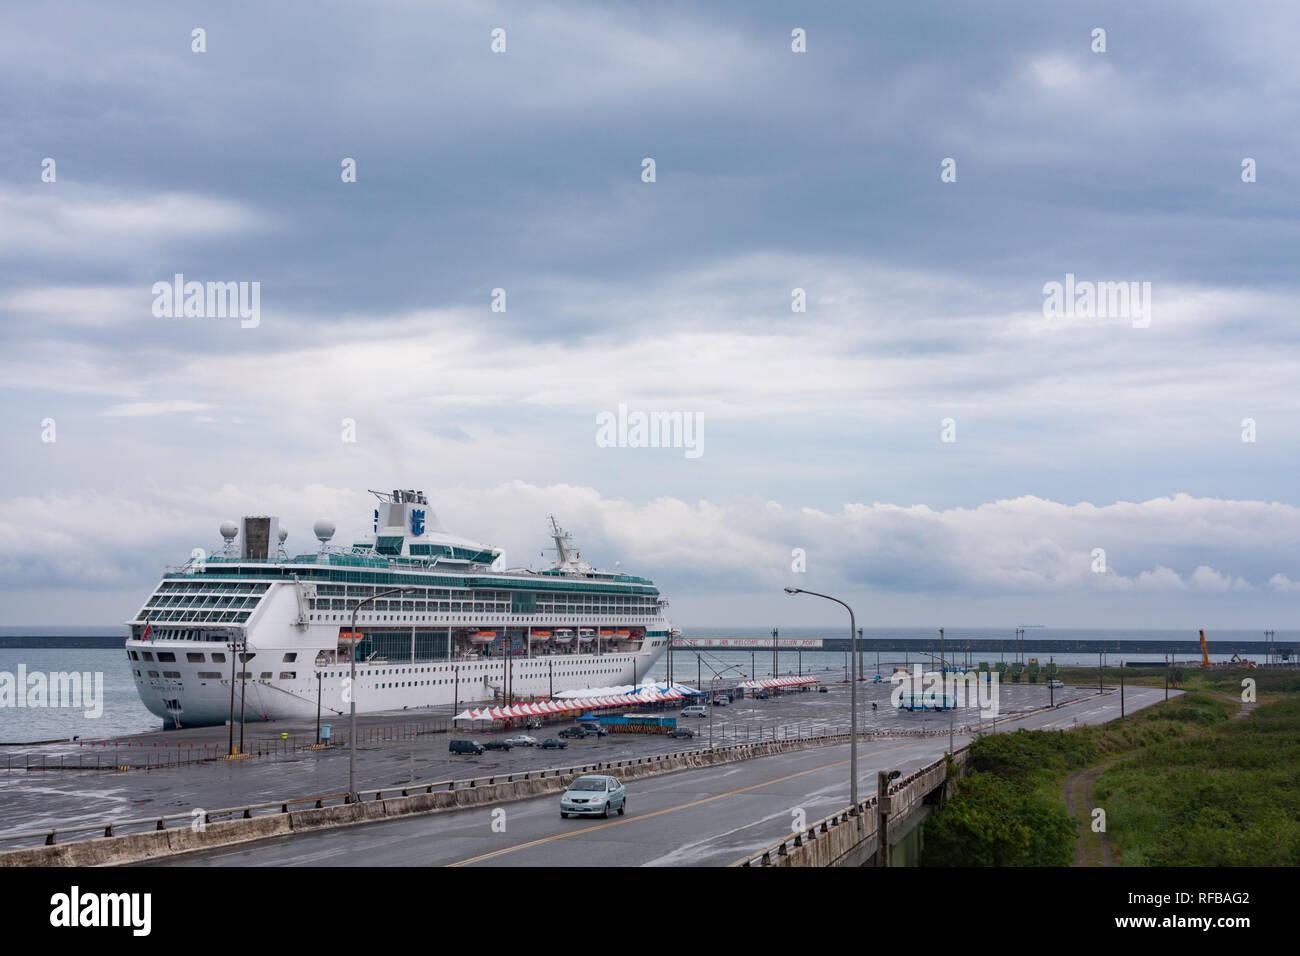 Royal Caribbean Cruises Ltd's Legend of the Seas cruise ship docks at Hualien Port, Taiwan - Stock Image